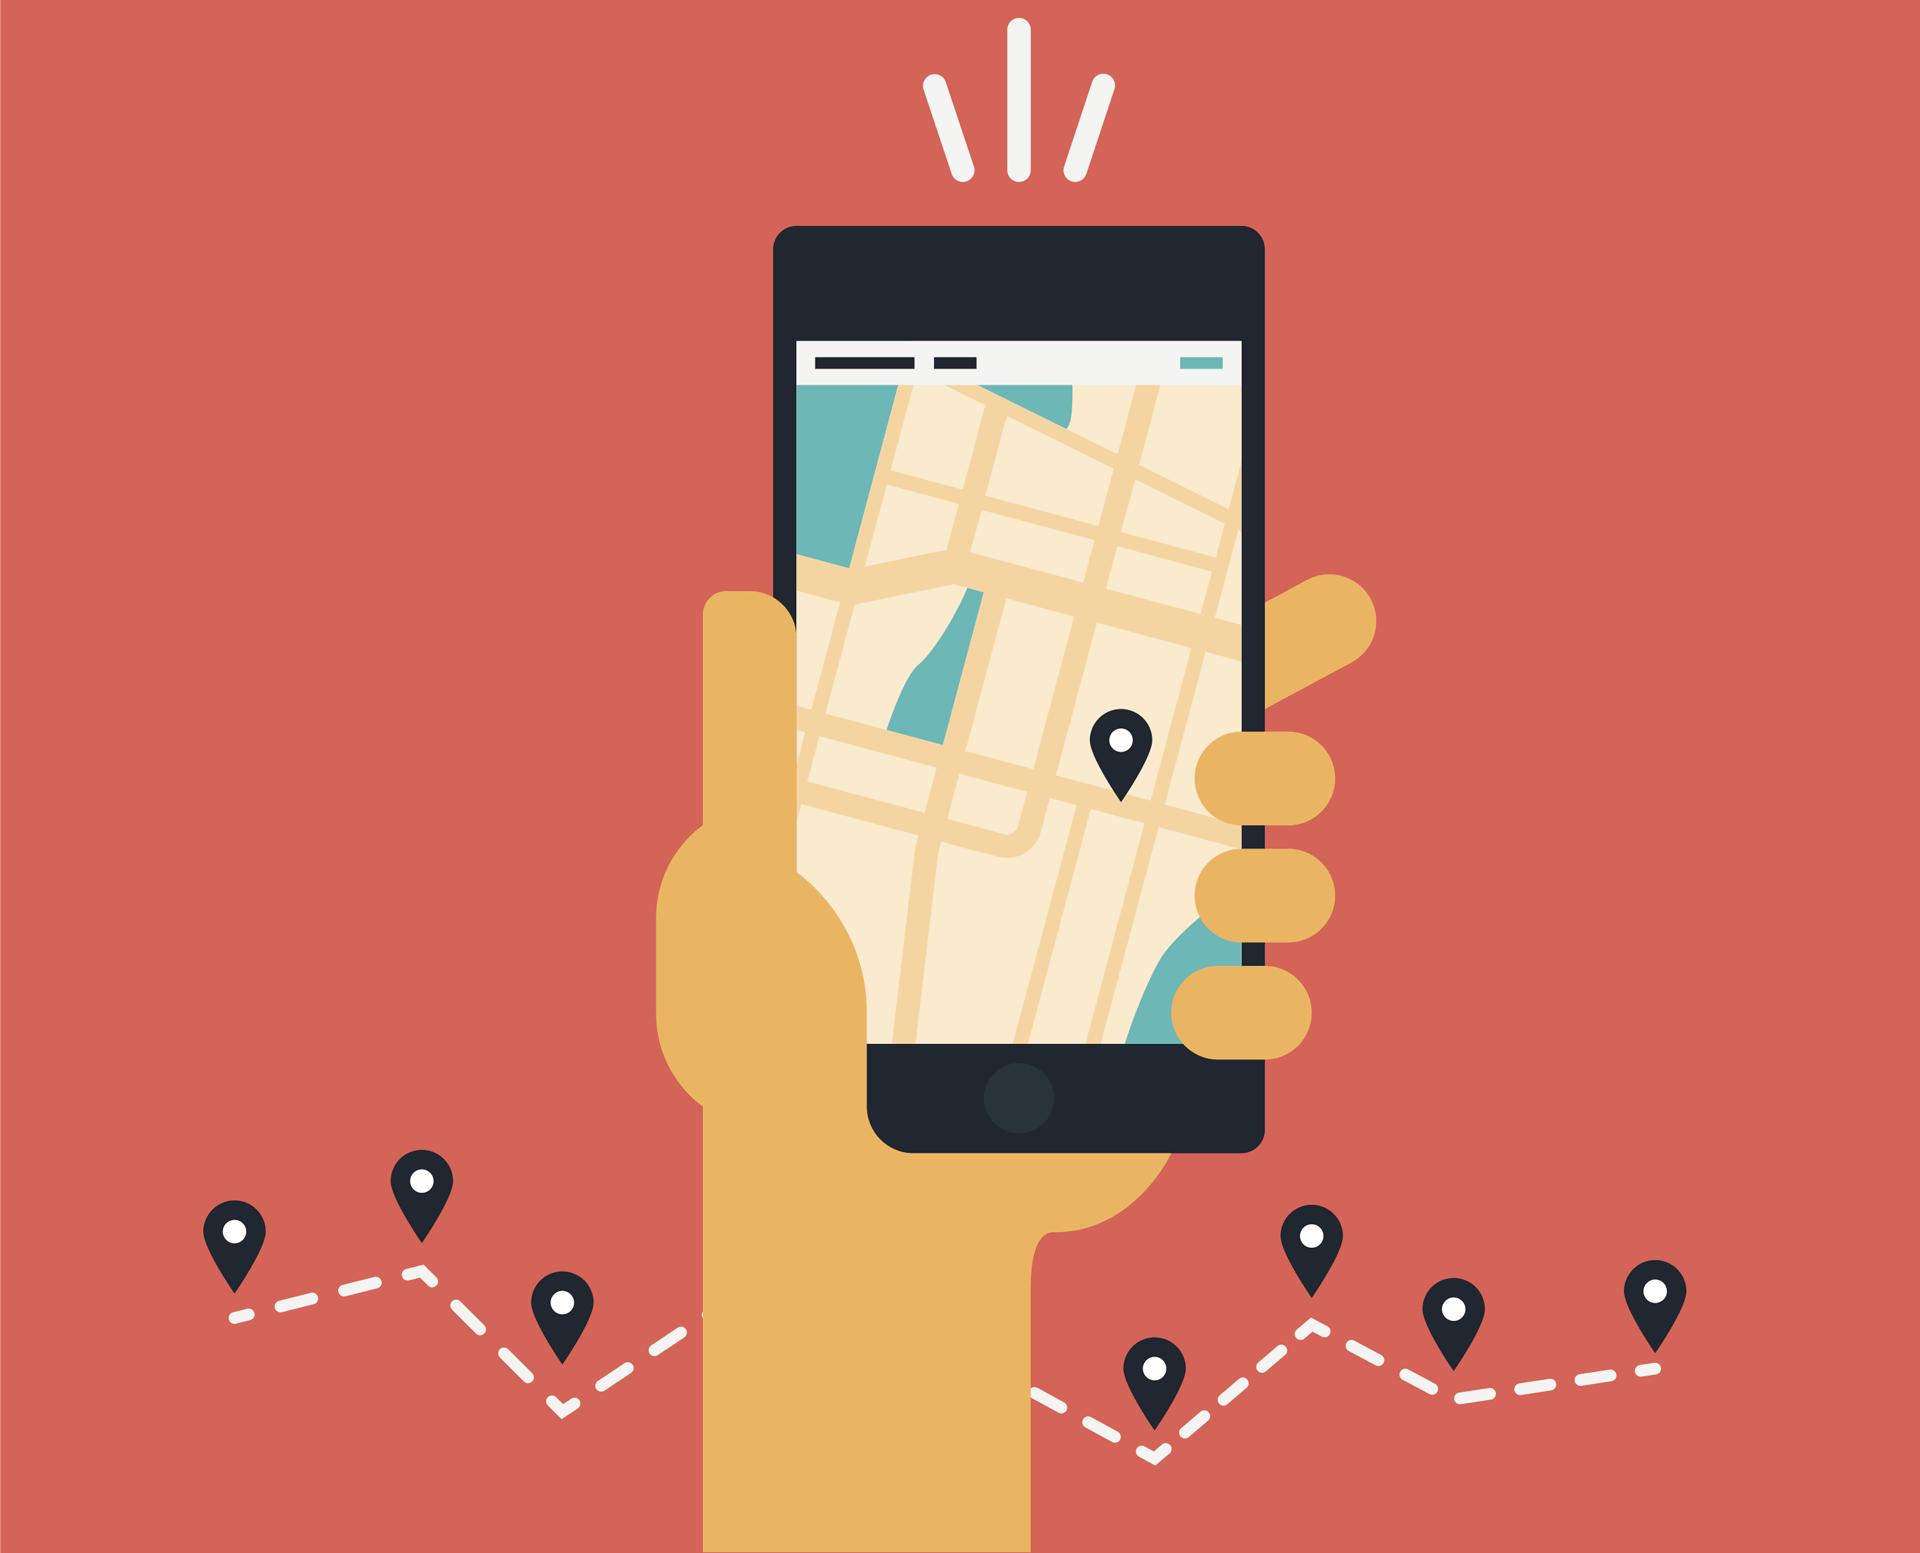 Best Mobile Tracker Apps - Top 10 Best Mobile Location Tracker